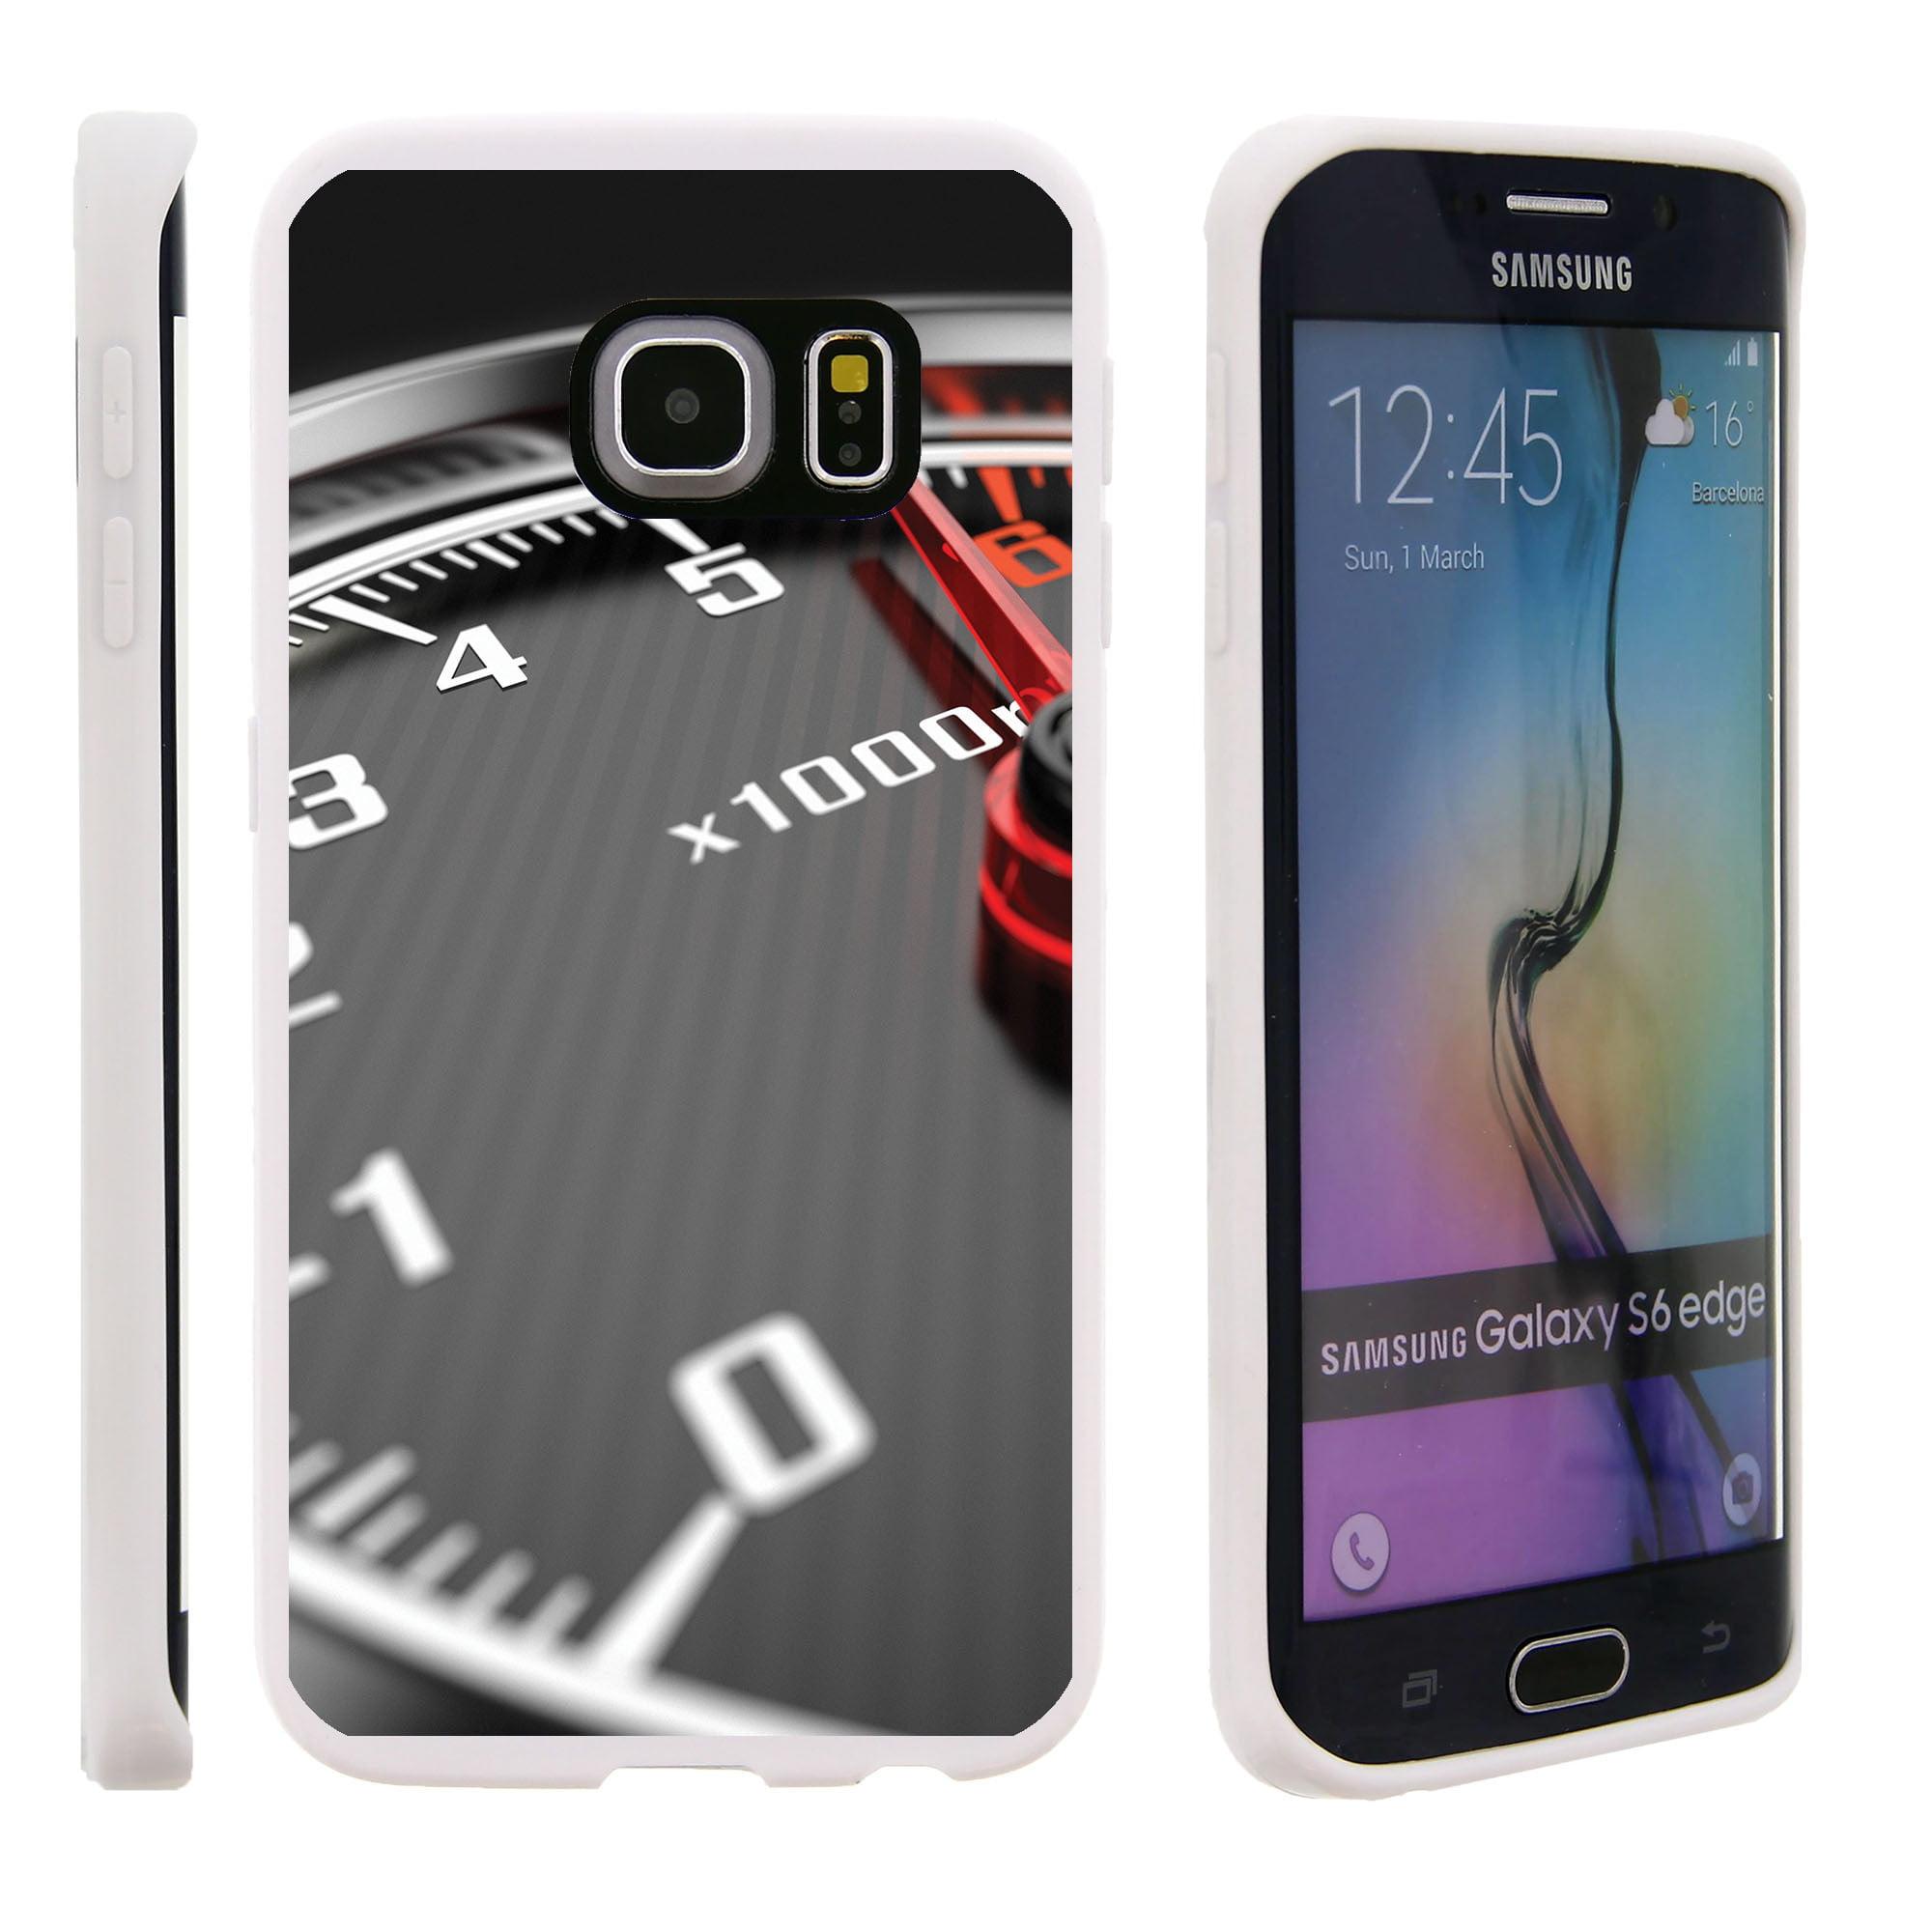 Samsung Galaxy S6 Edge G925, Flexible Case [FLEX FORCE] Slim Durable TPU Sleek Bumper with Unique Designs - Close up Speedometer